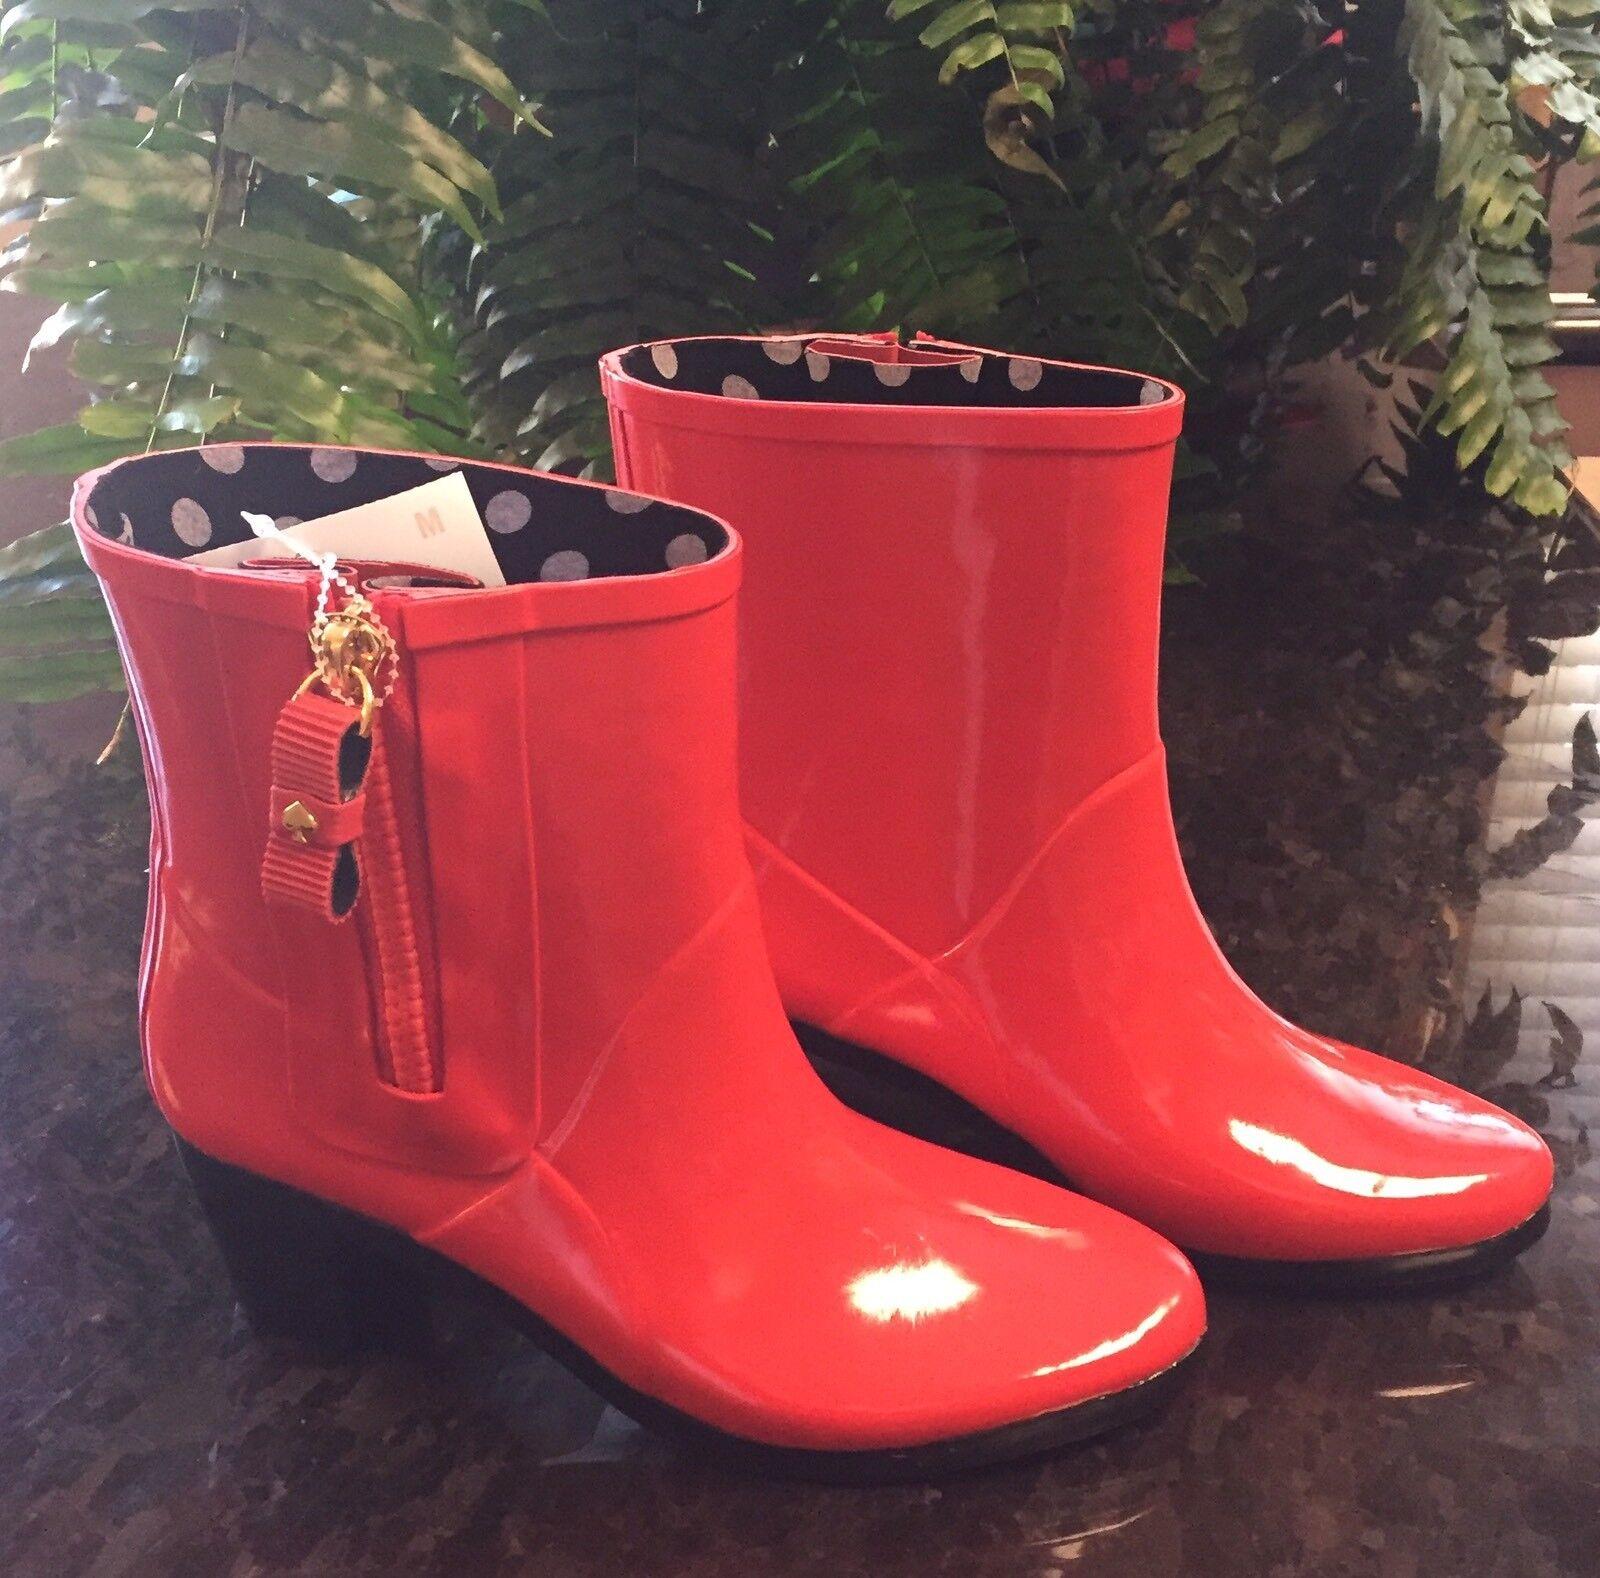 NWT Kate Spade Rain Snow Boots Booties 7